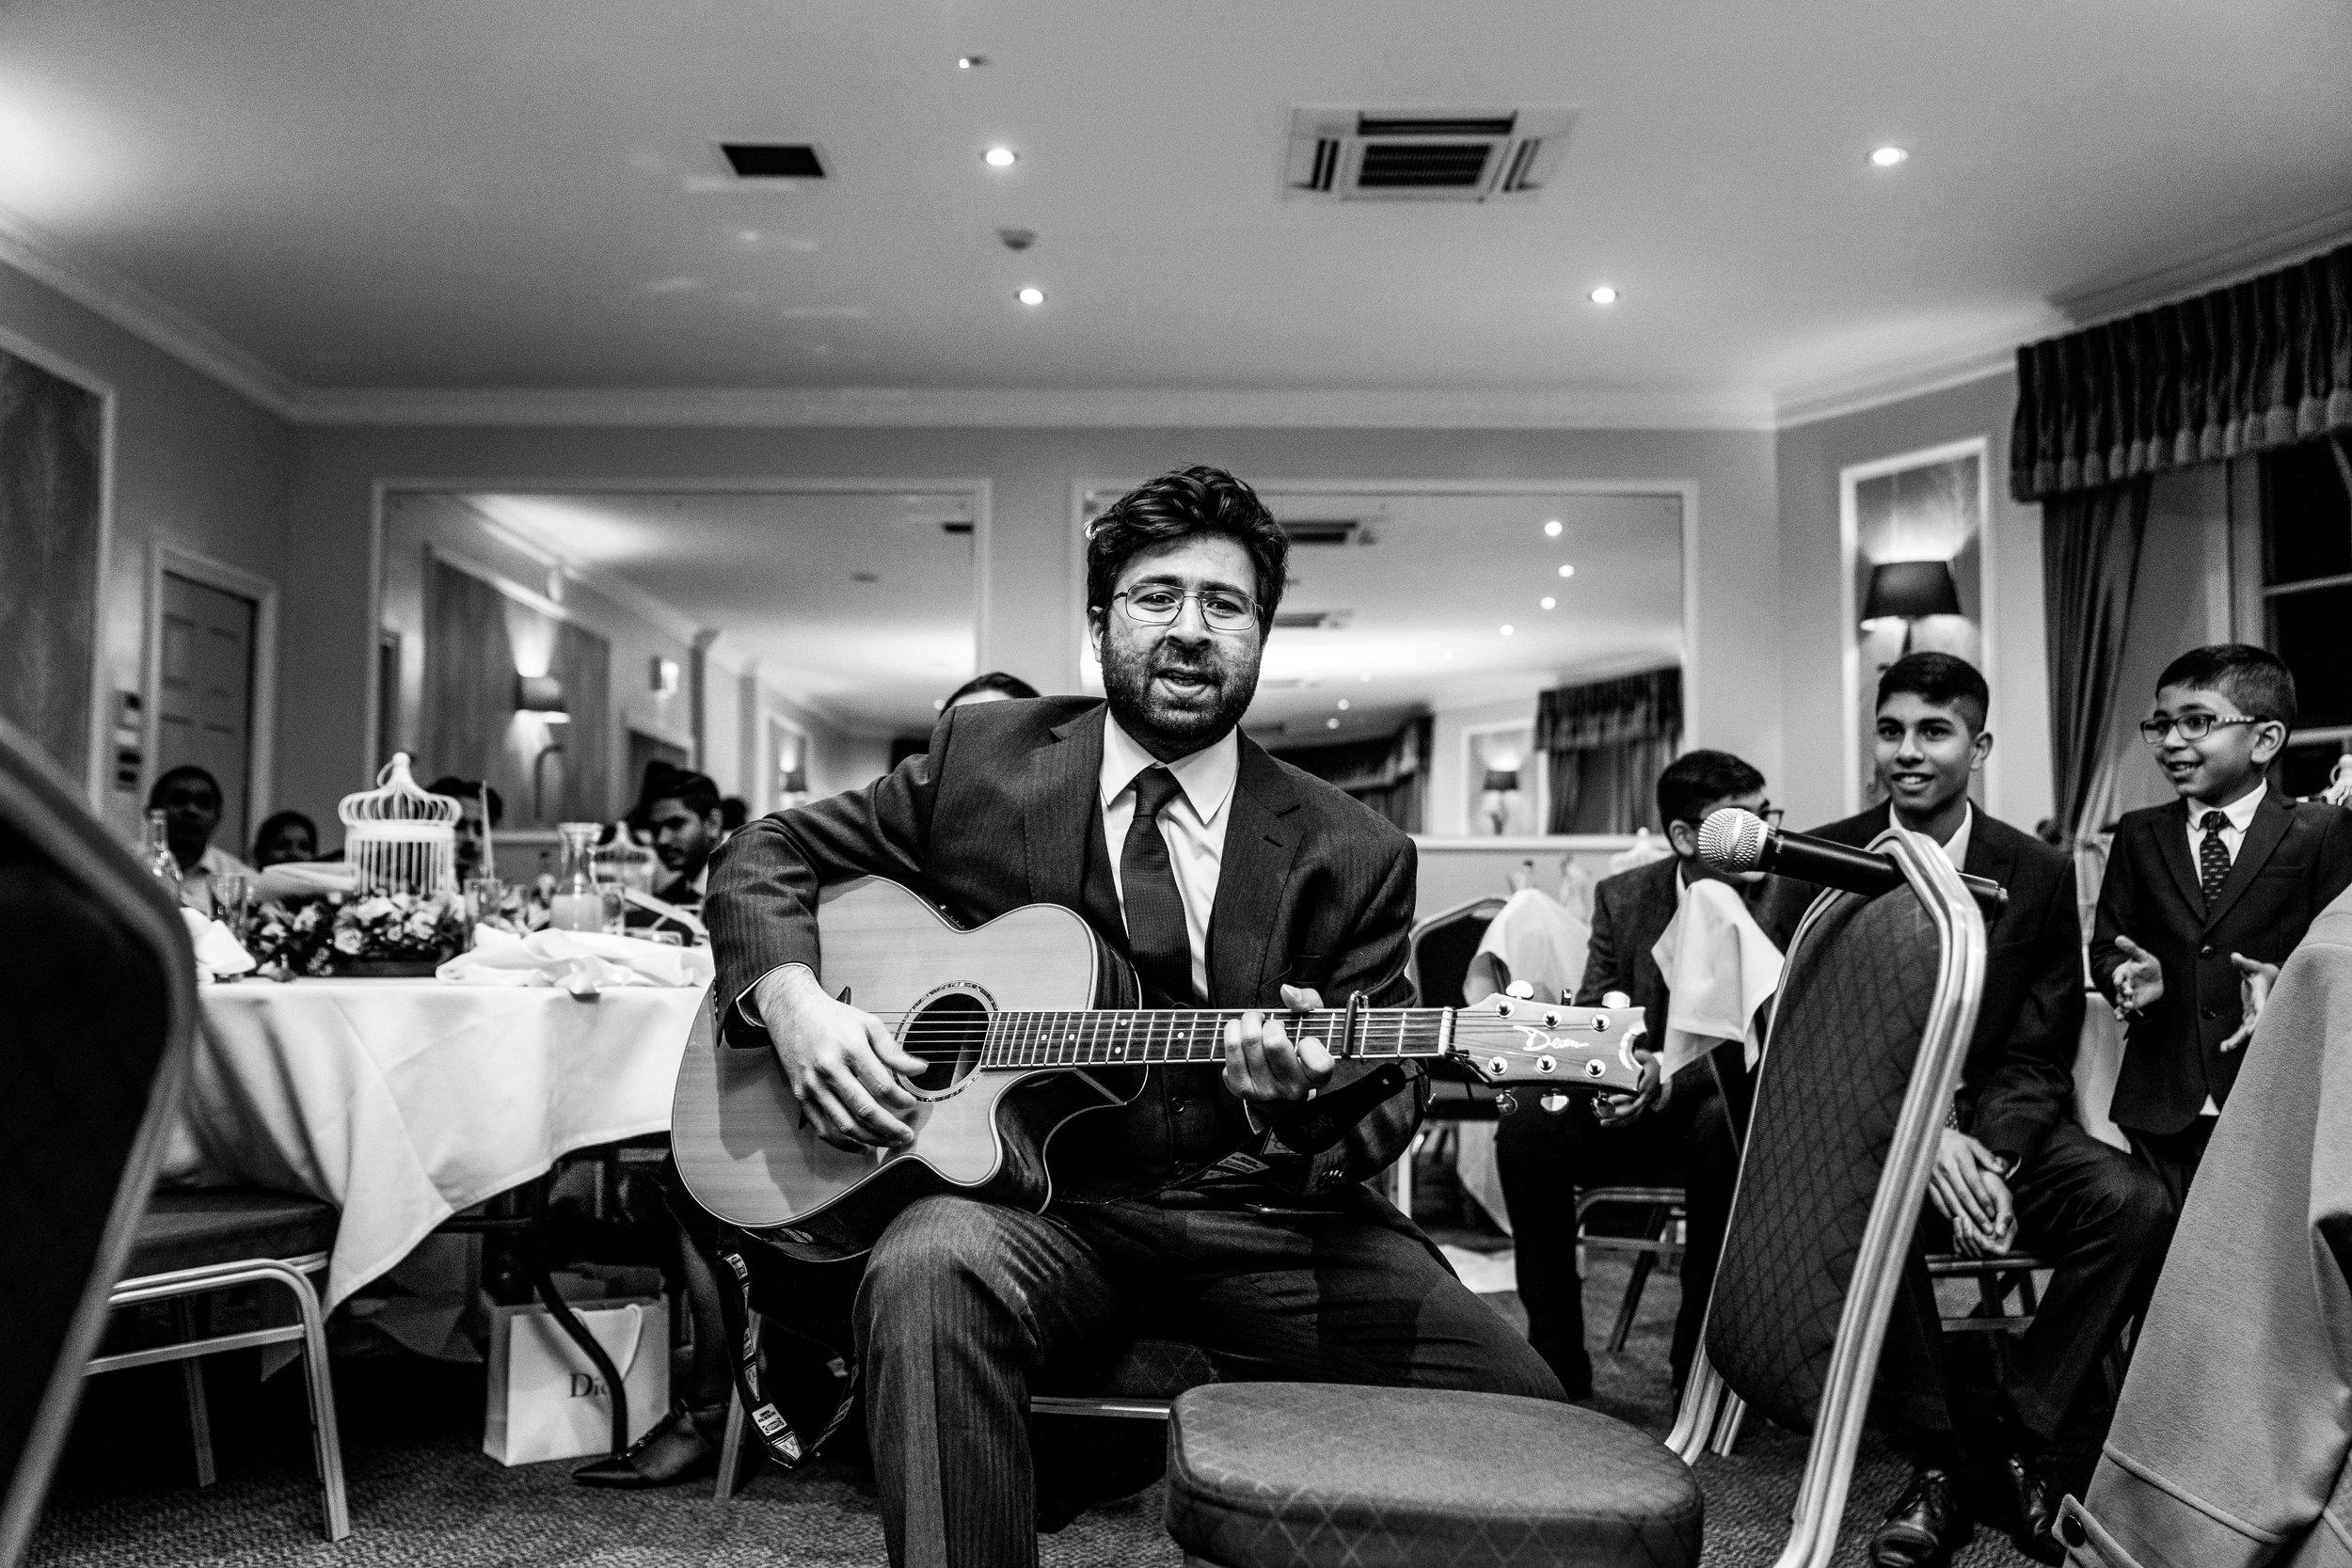 buckinghamshire-golf-club-winter-muslim-wedding-engagement-photography-videography-43